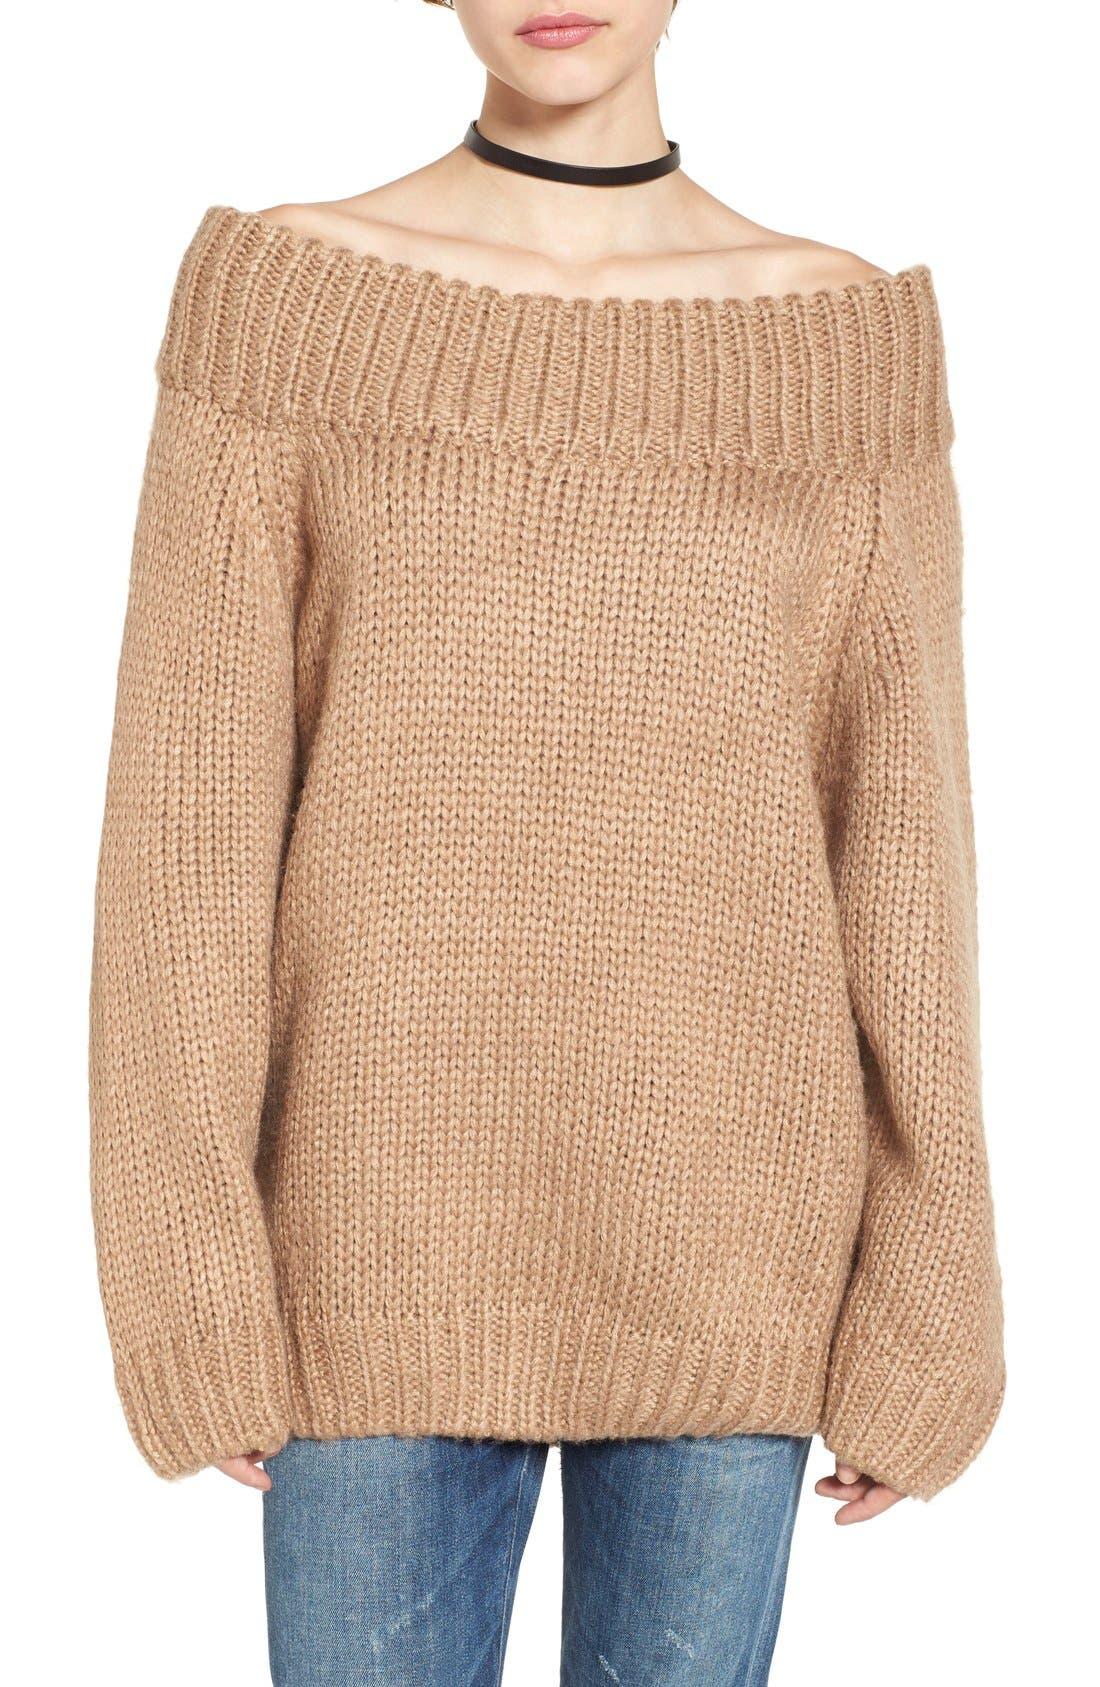 Alternate Image 1 Selected - Cotton Emporium Off the Shoulder Knit Pullover